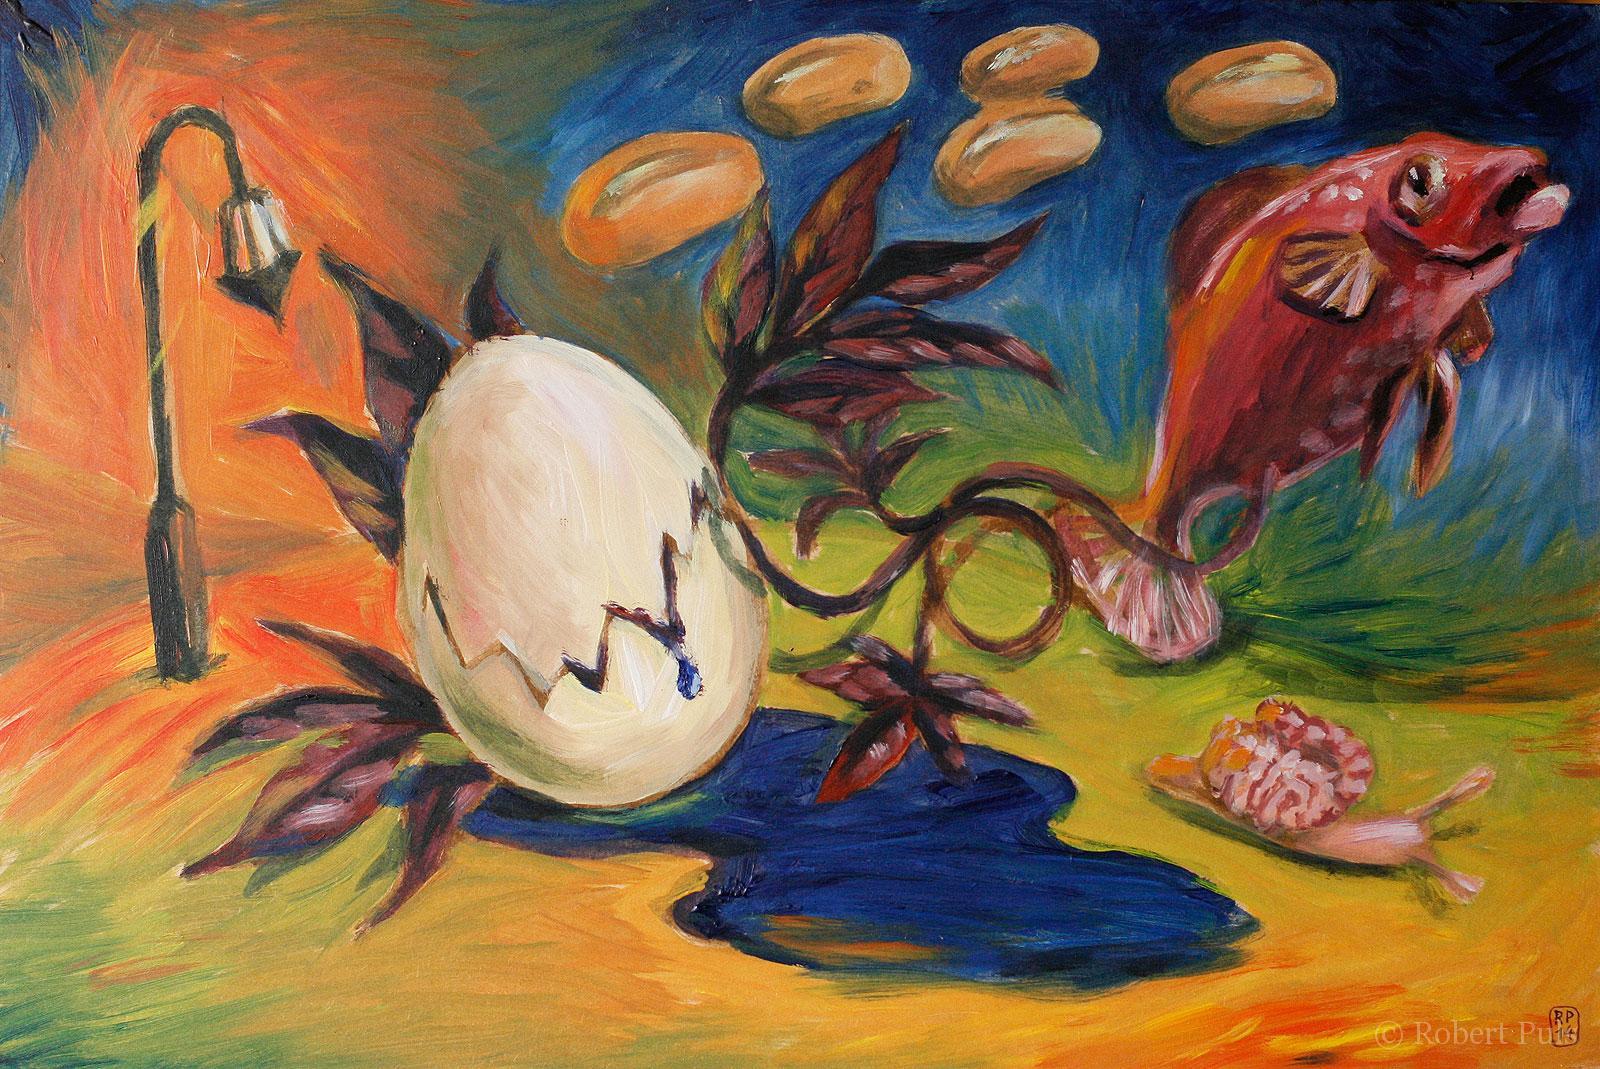 Verbindung Malerei Acryl surreal